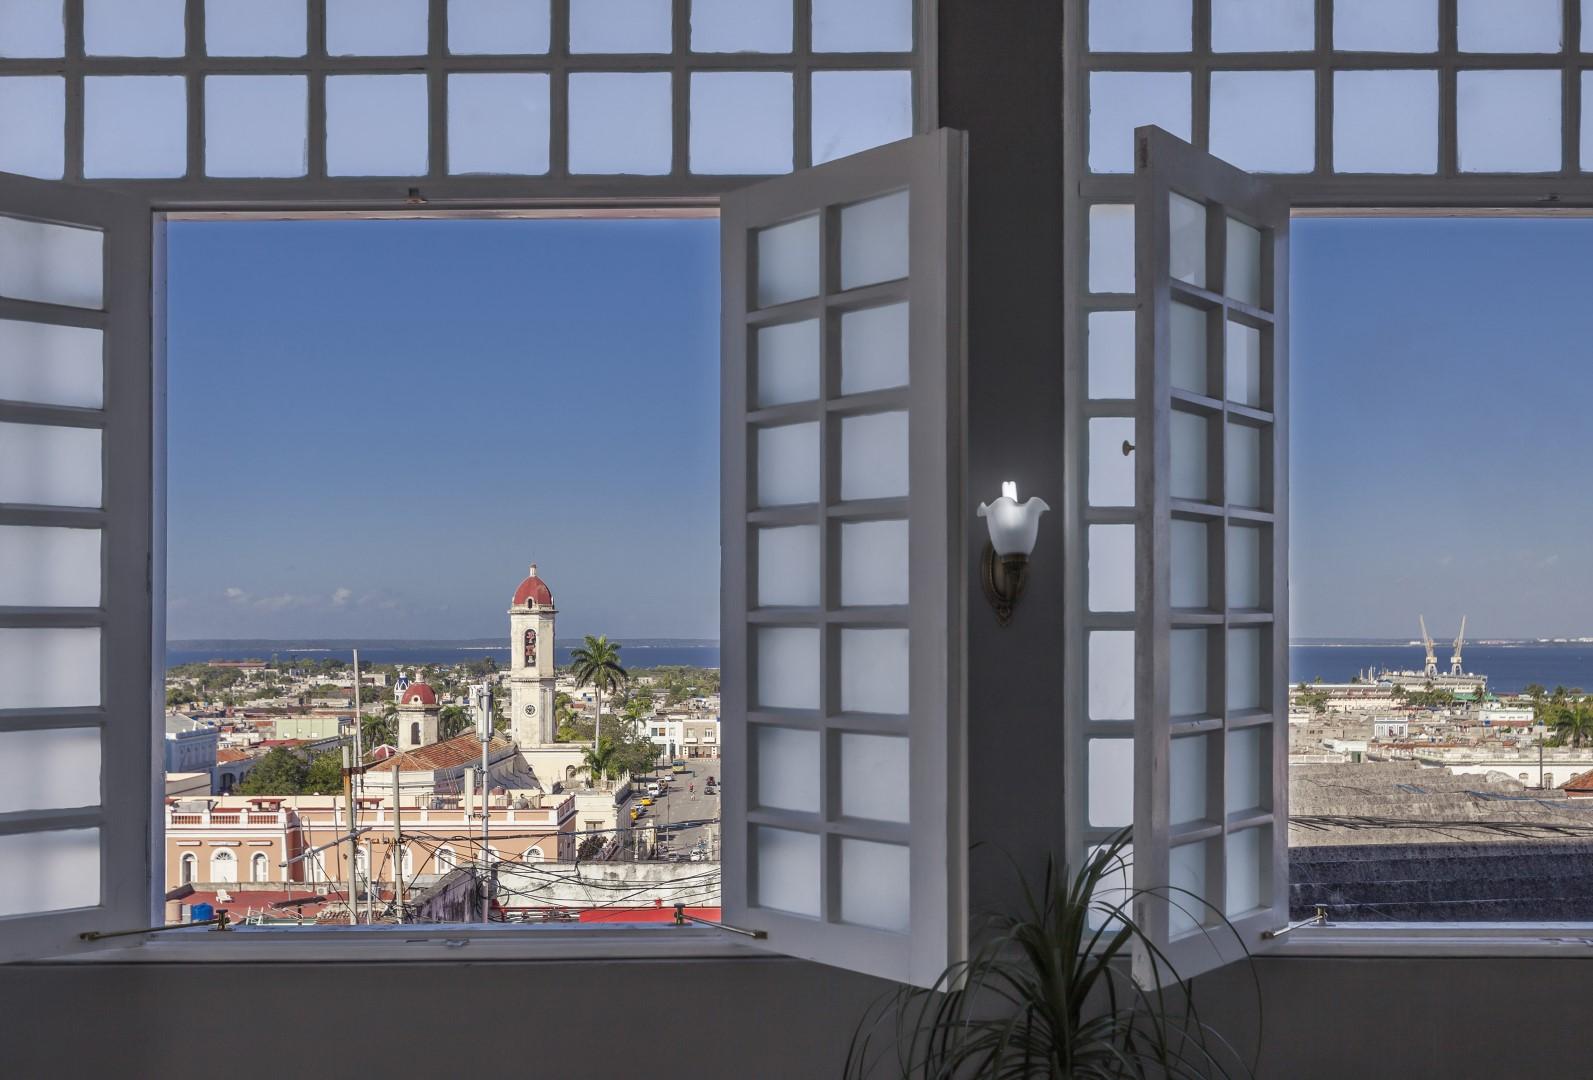 View from rooftop at Melia San Carlos